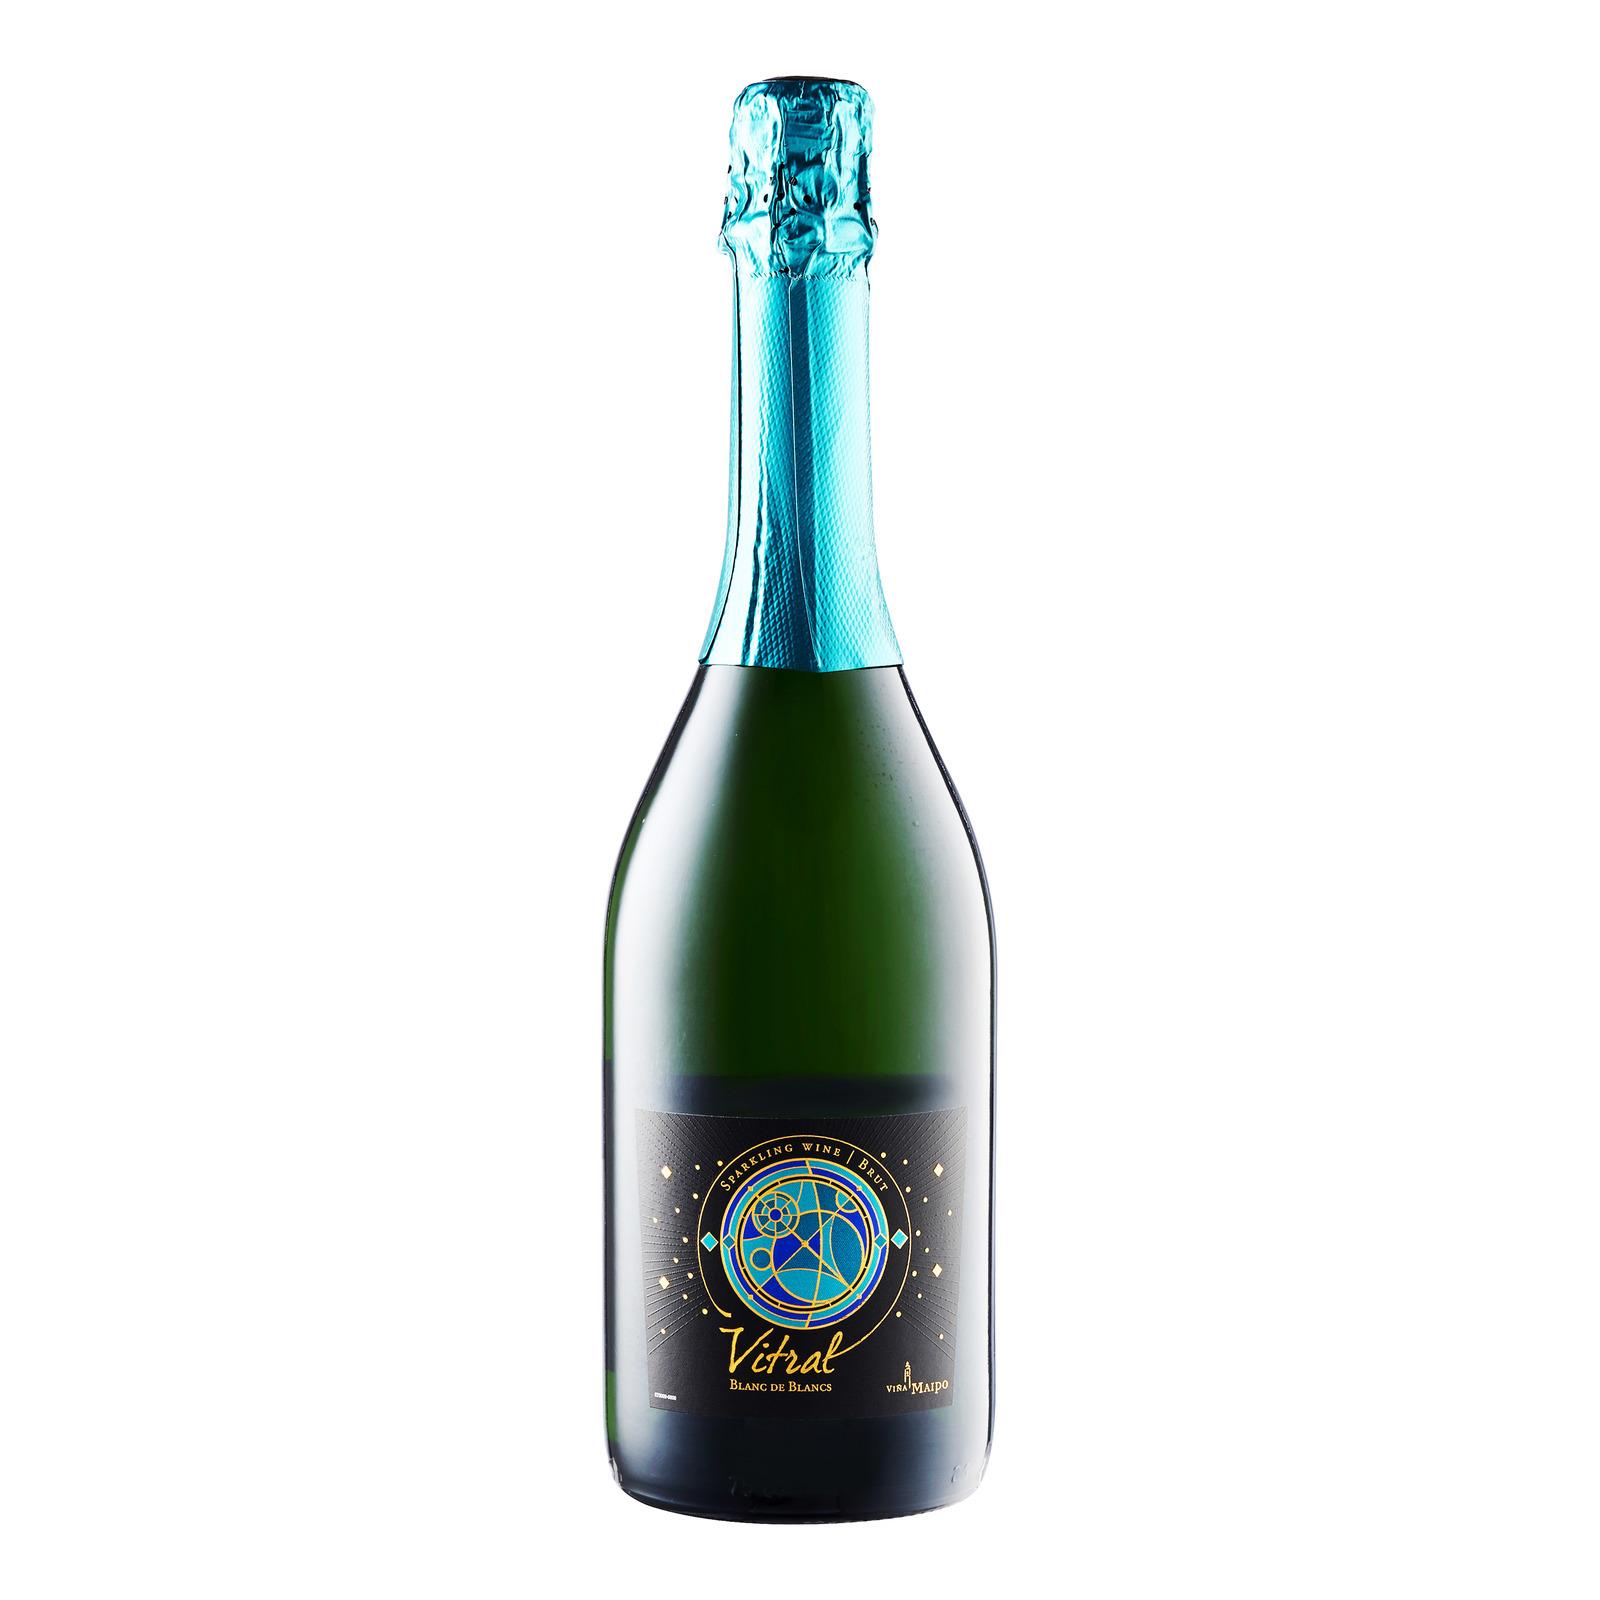 Vina Maipo Sparkling Wine - Vitral (Brut)